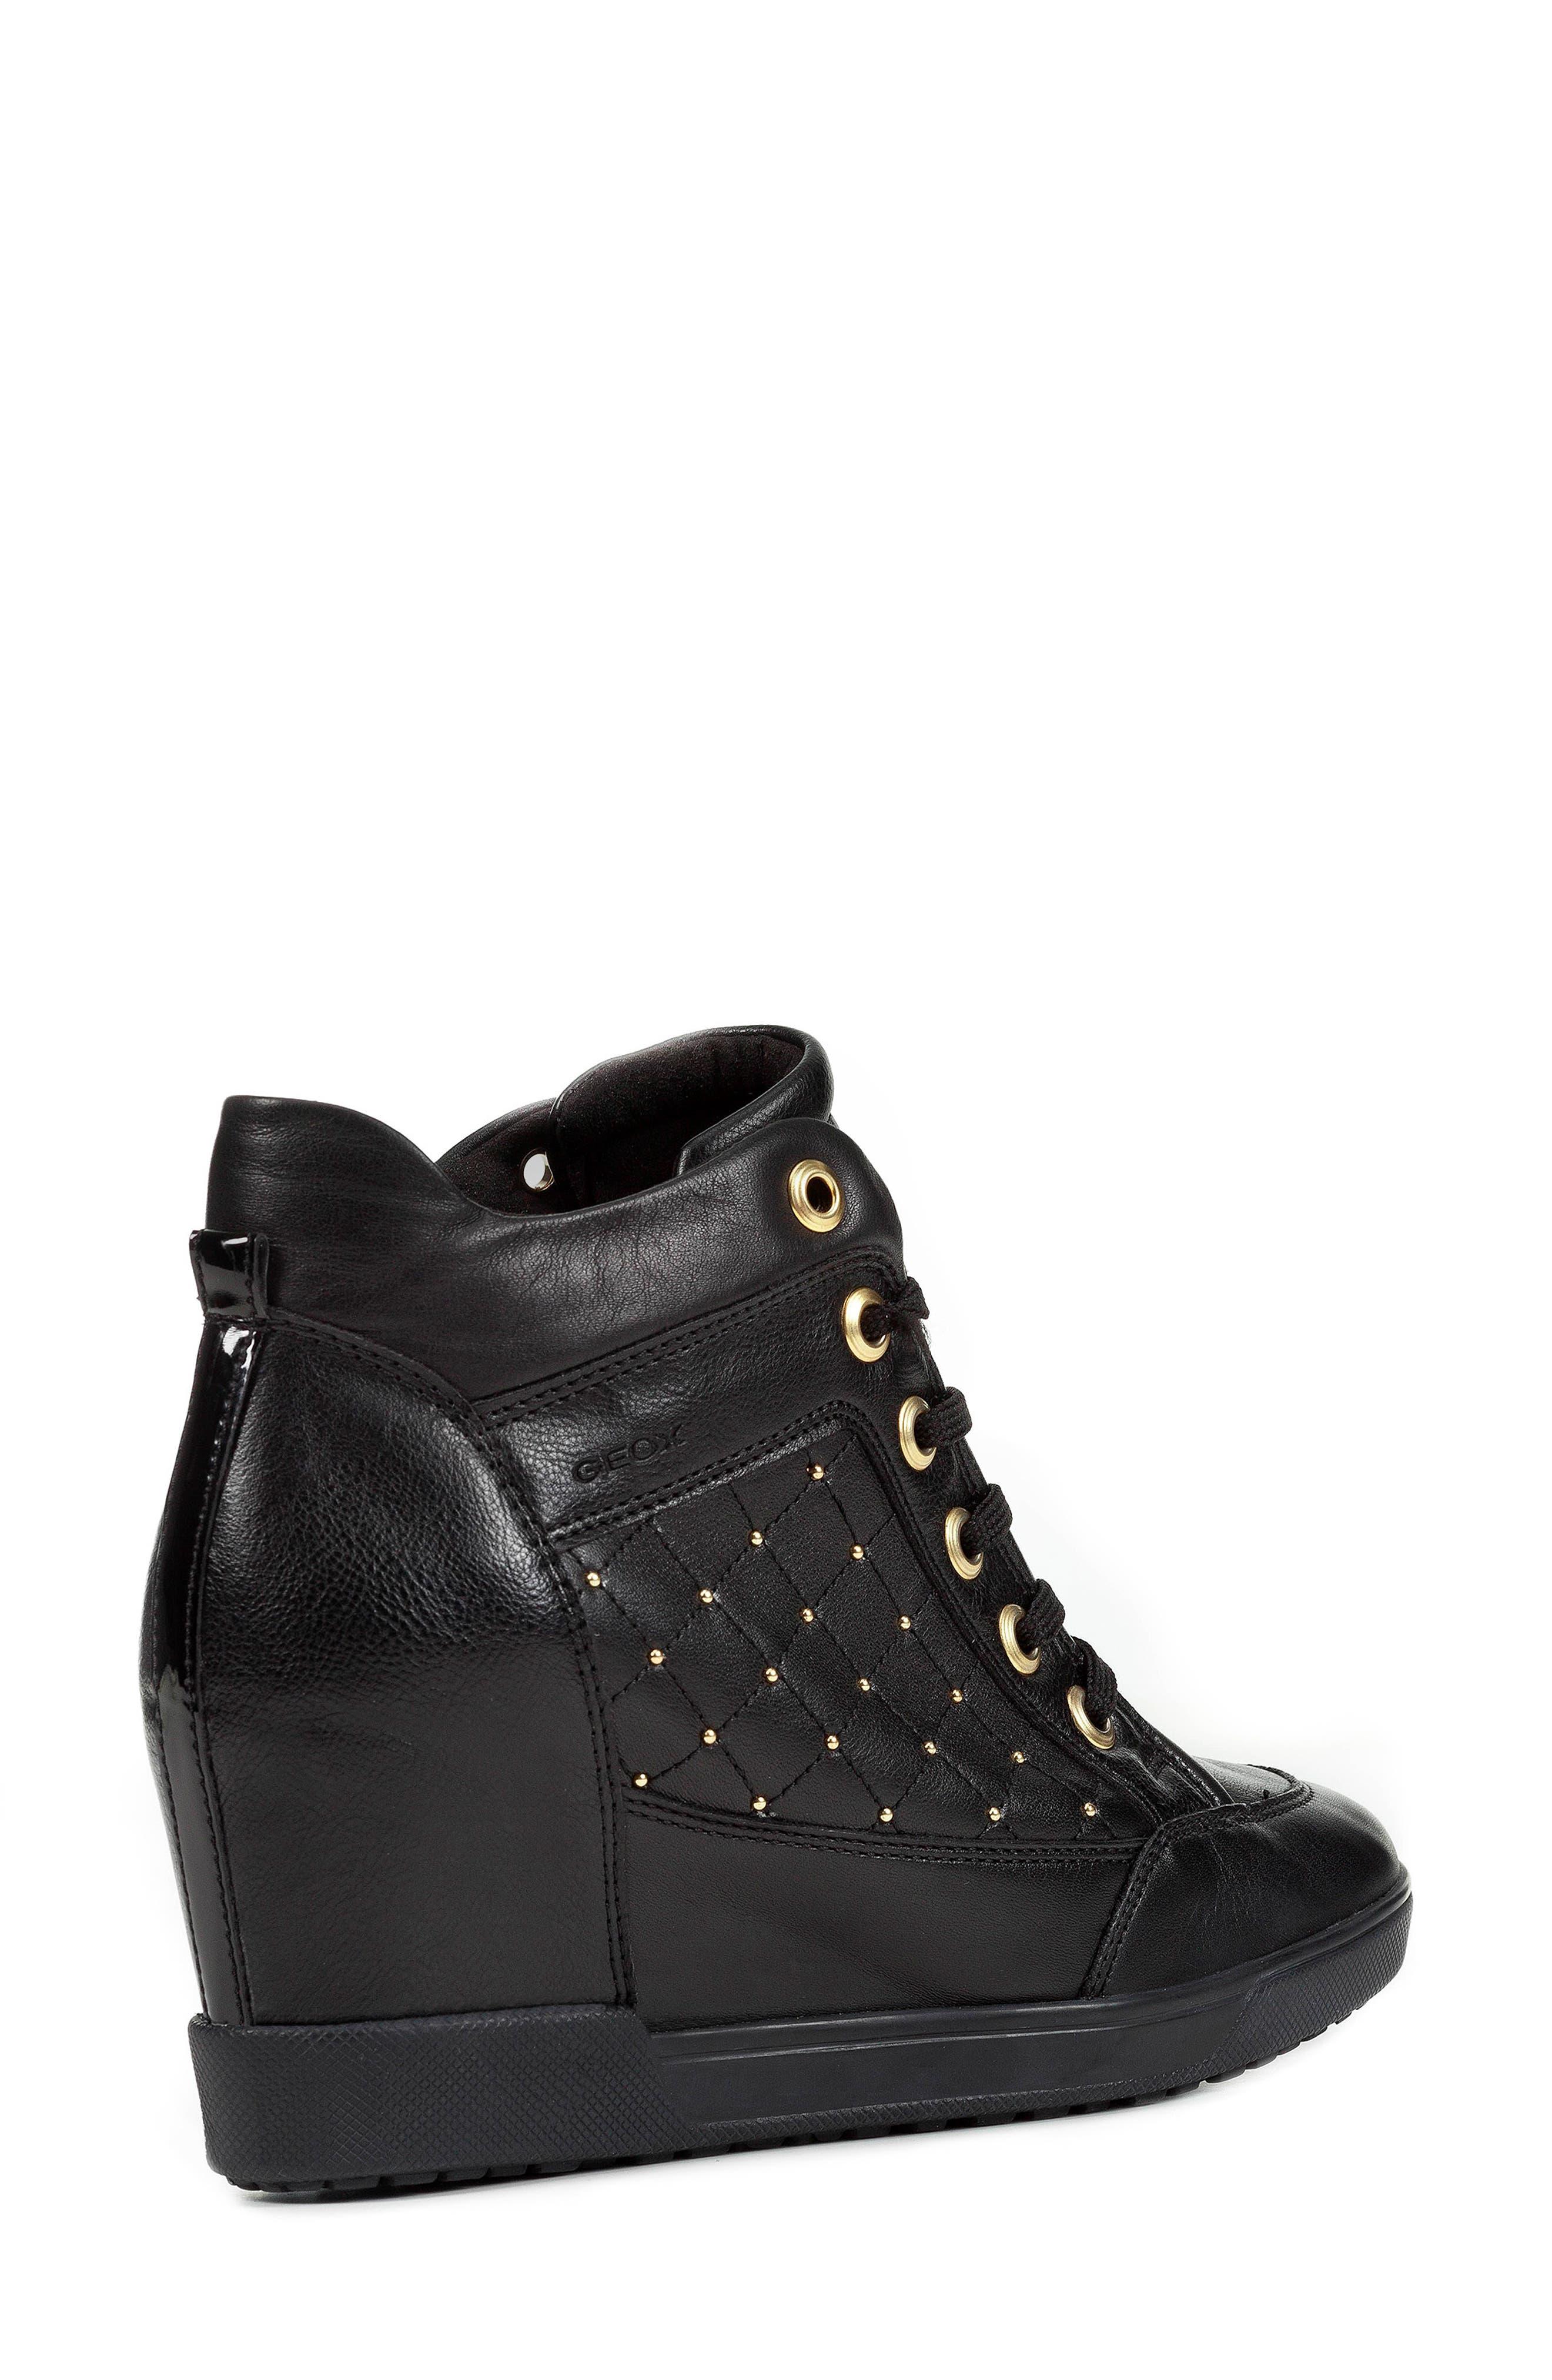 GEOX, Carum Wedge Sneaker, Alternate thumbnail 2, color, 001